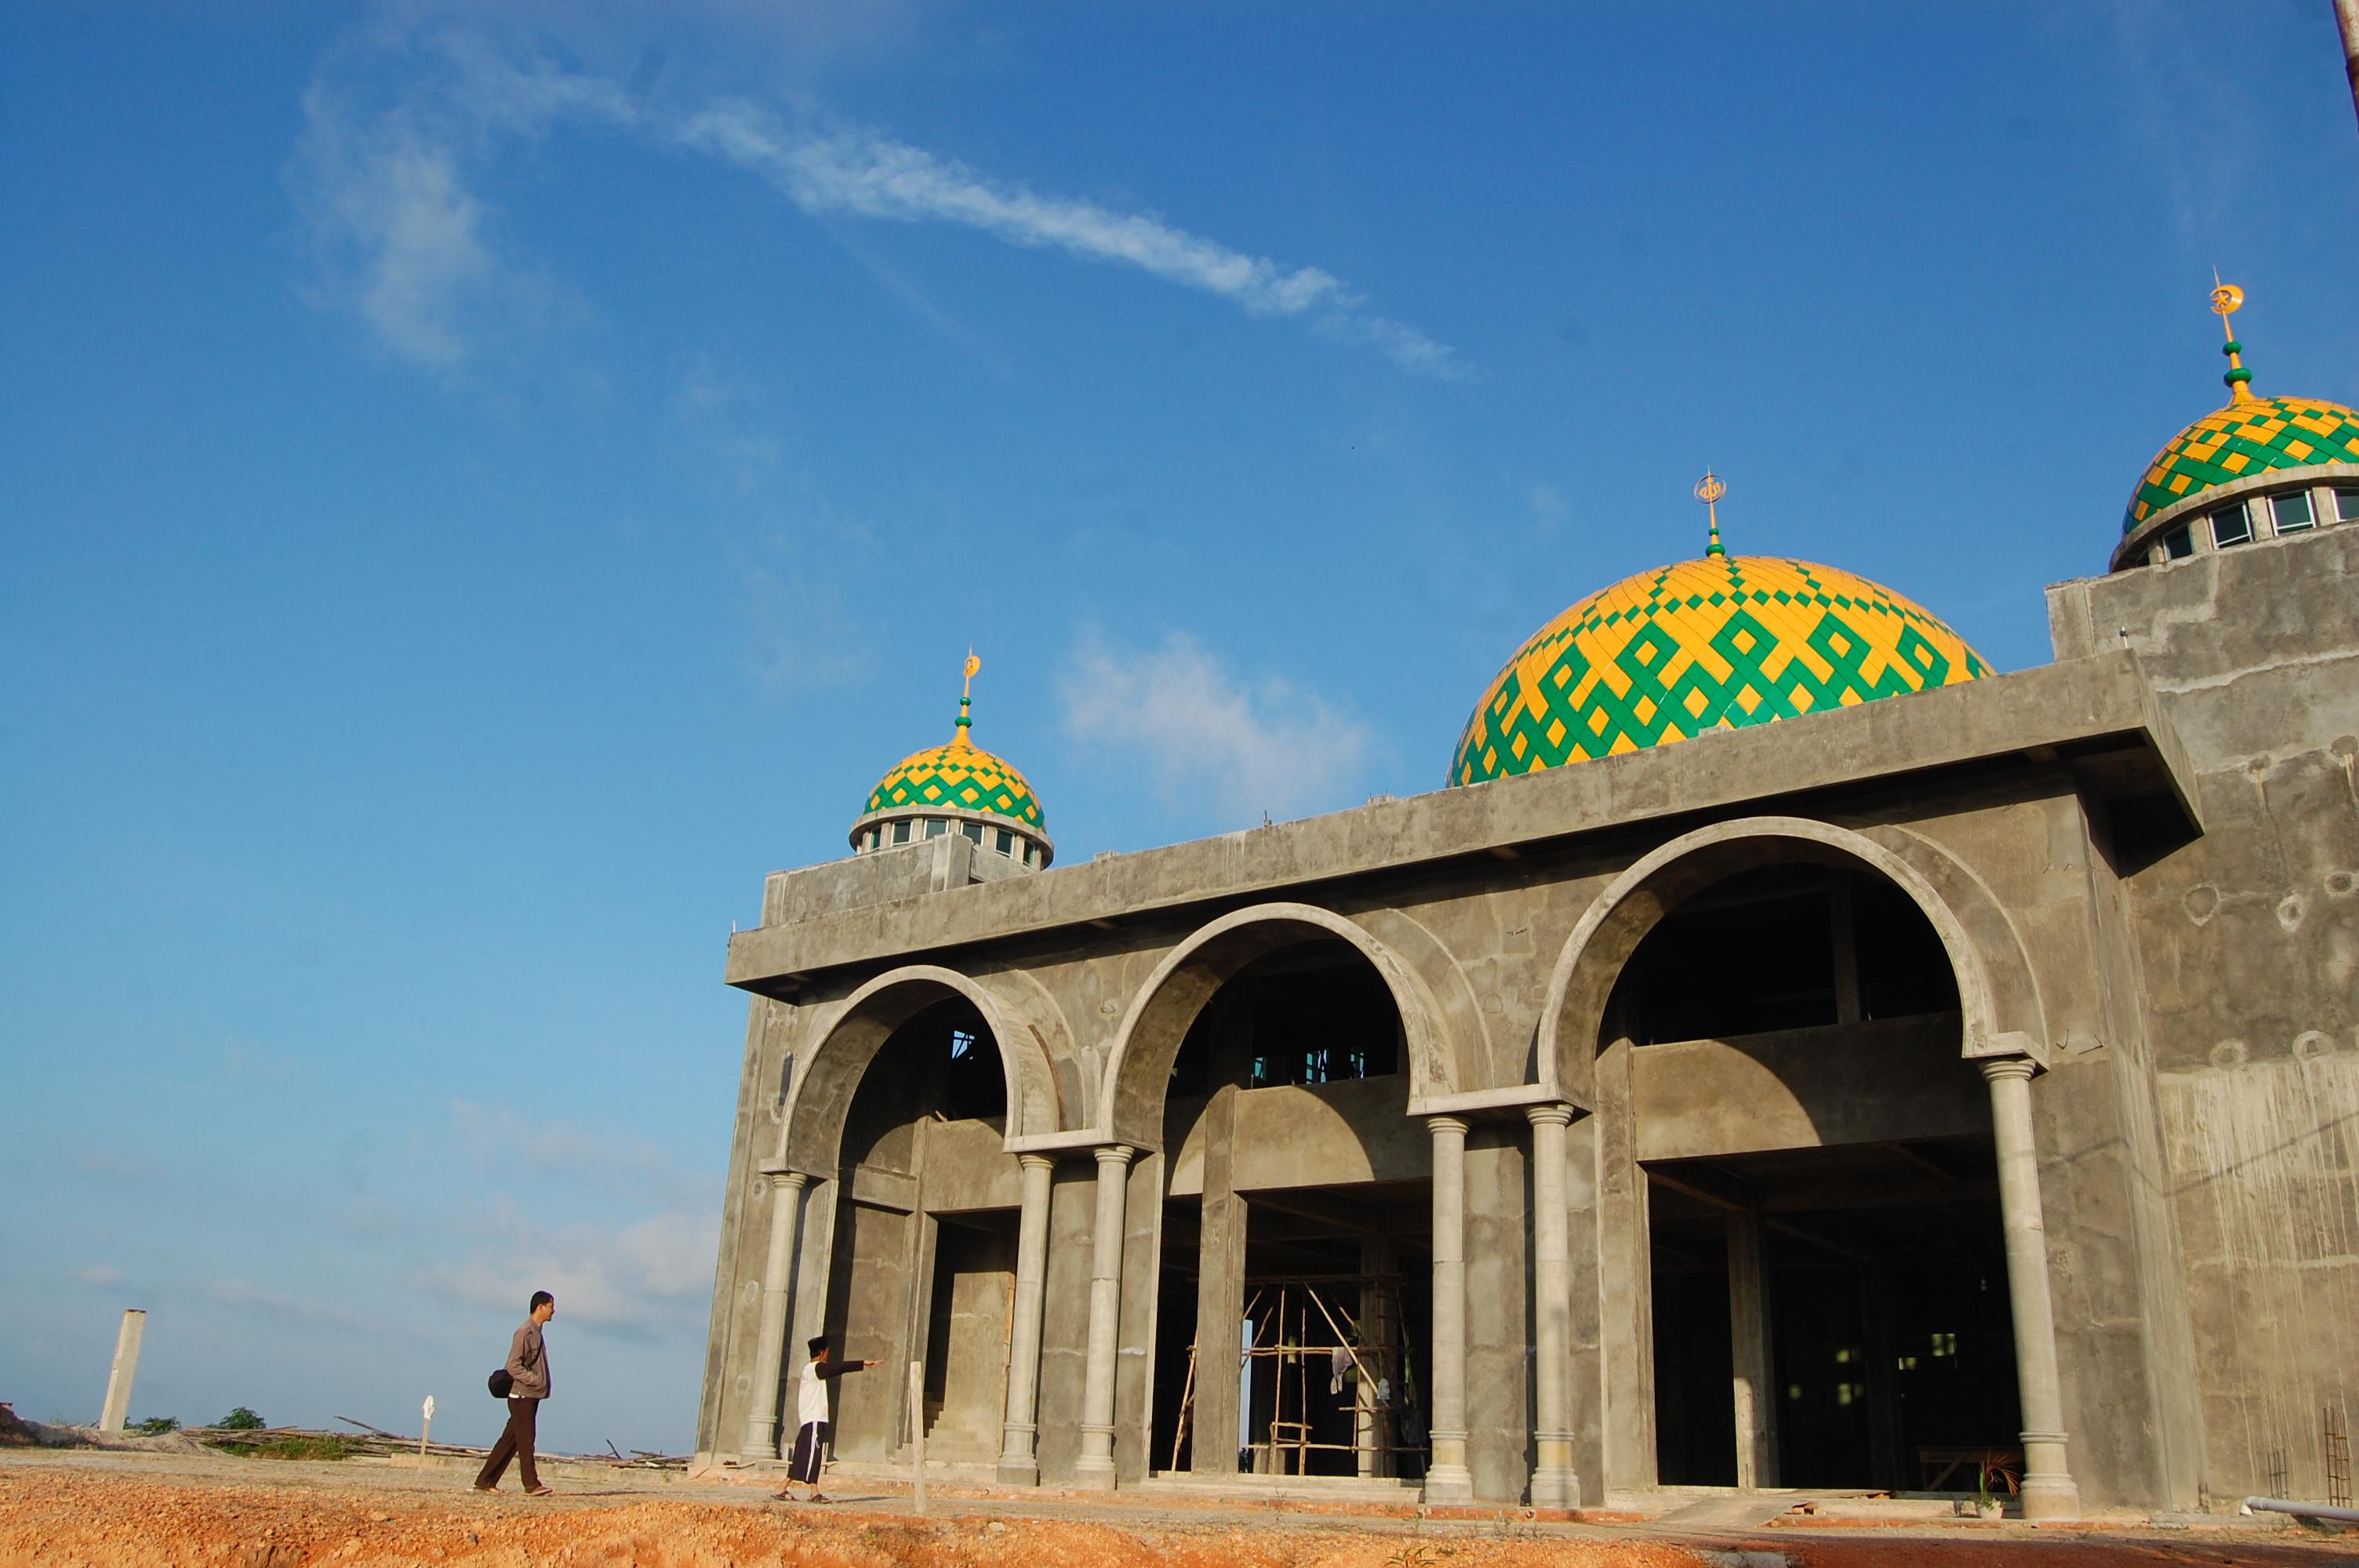 Bintan Masjid Raya Baitul Makmur Tanjung Uban Robbi Hafzan 2012